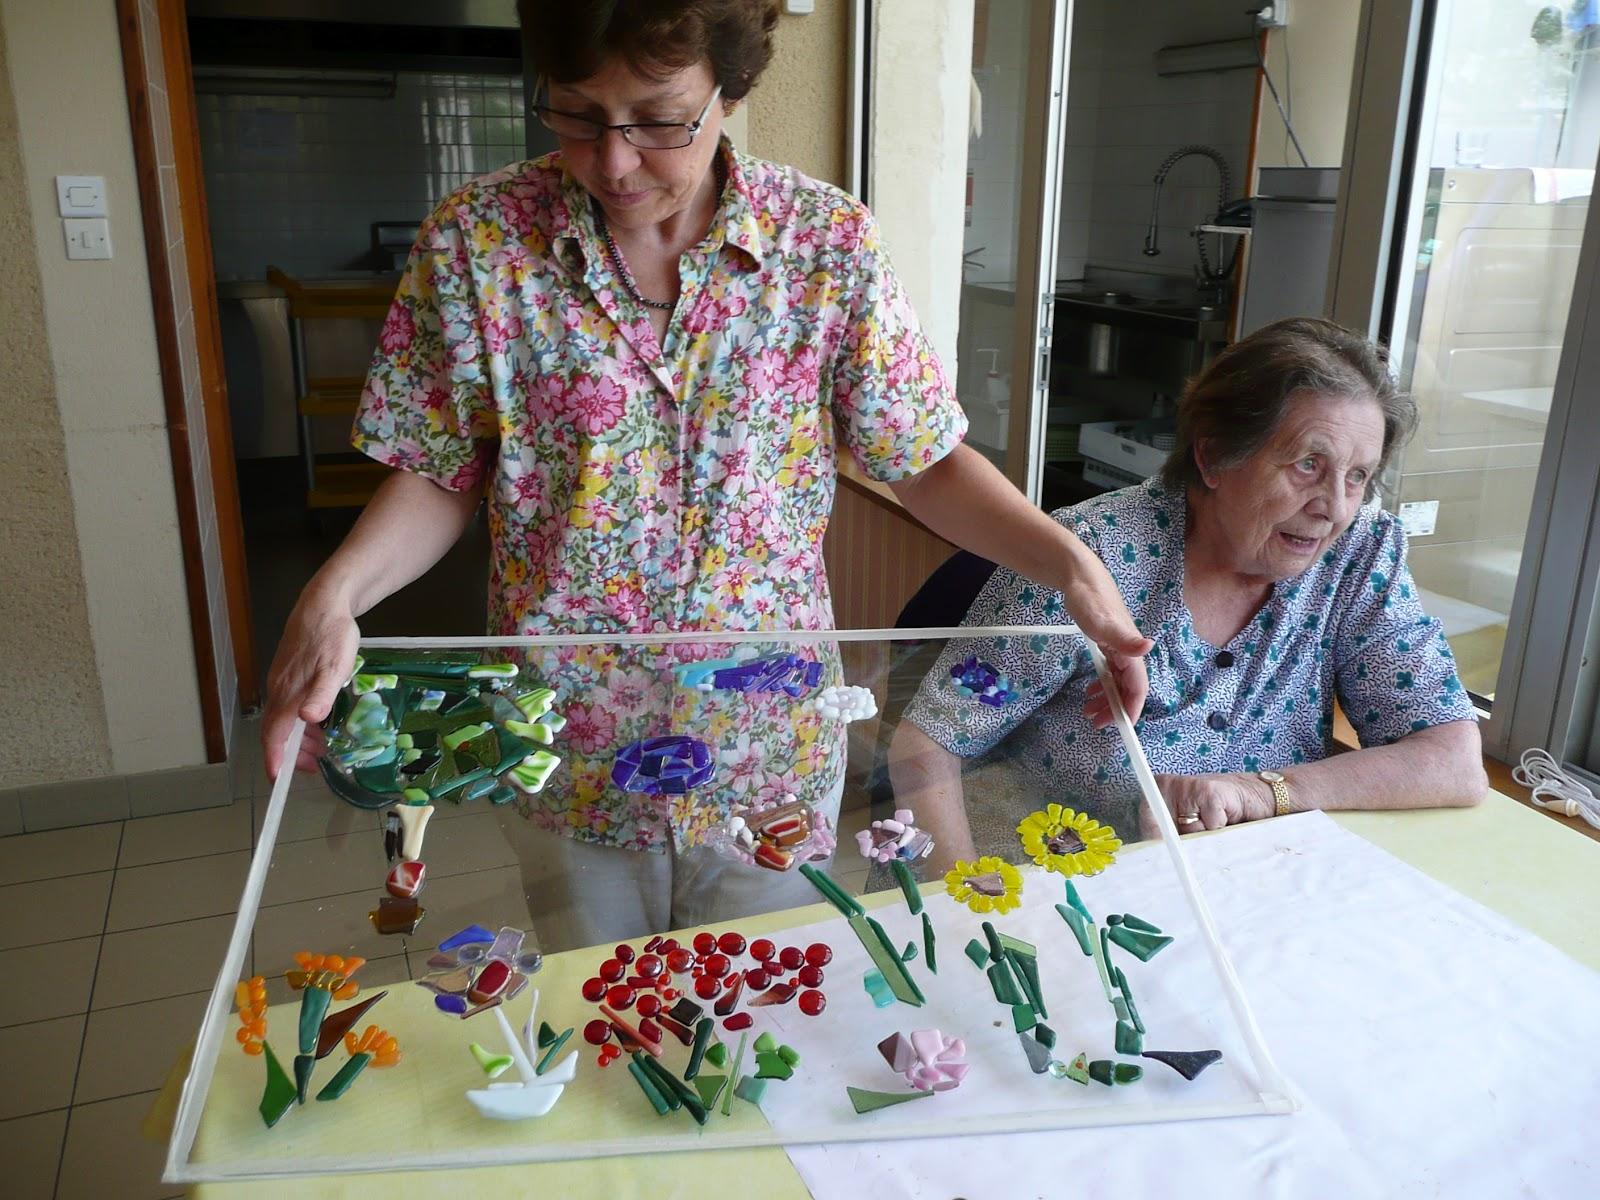 Des id es en verre animation en maison de retraite for Animation en maison de retraite